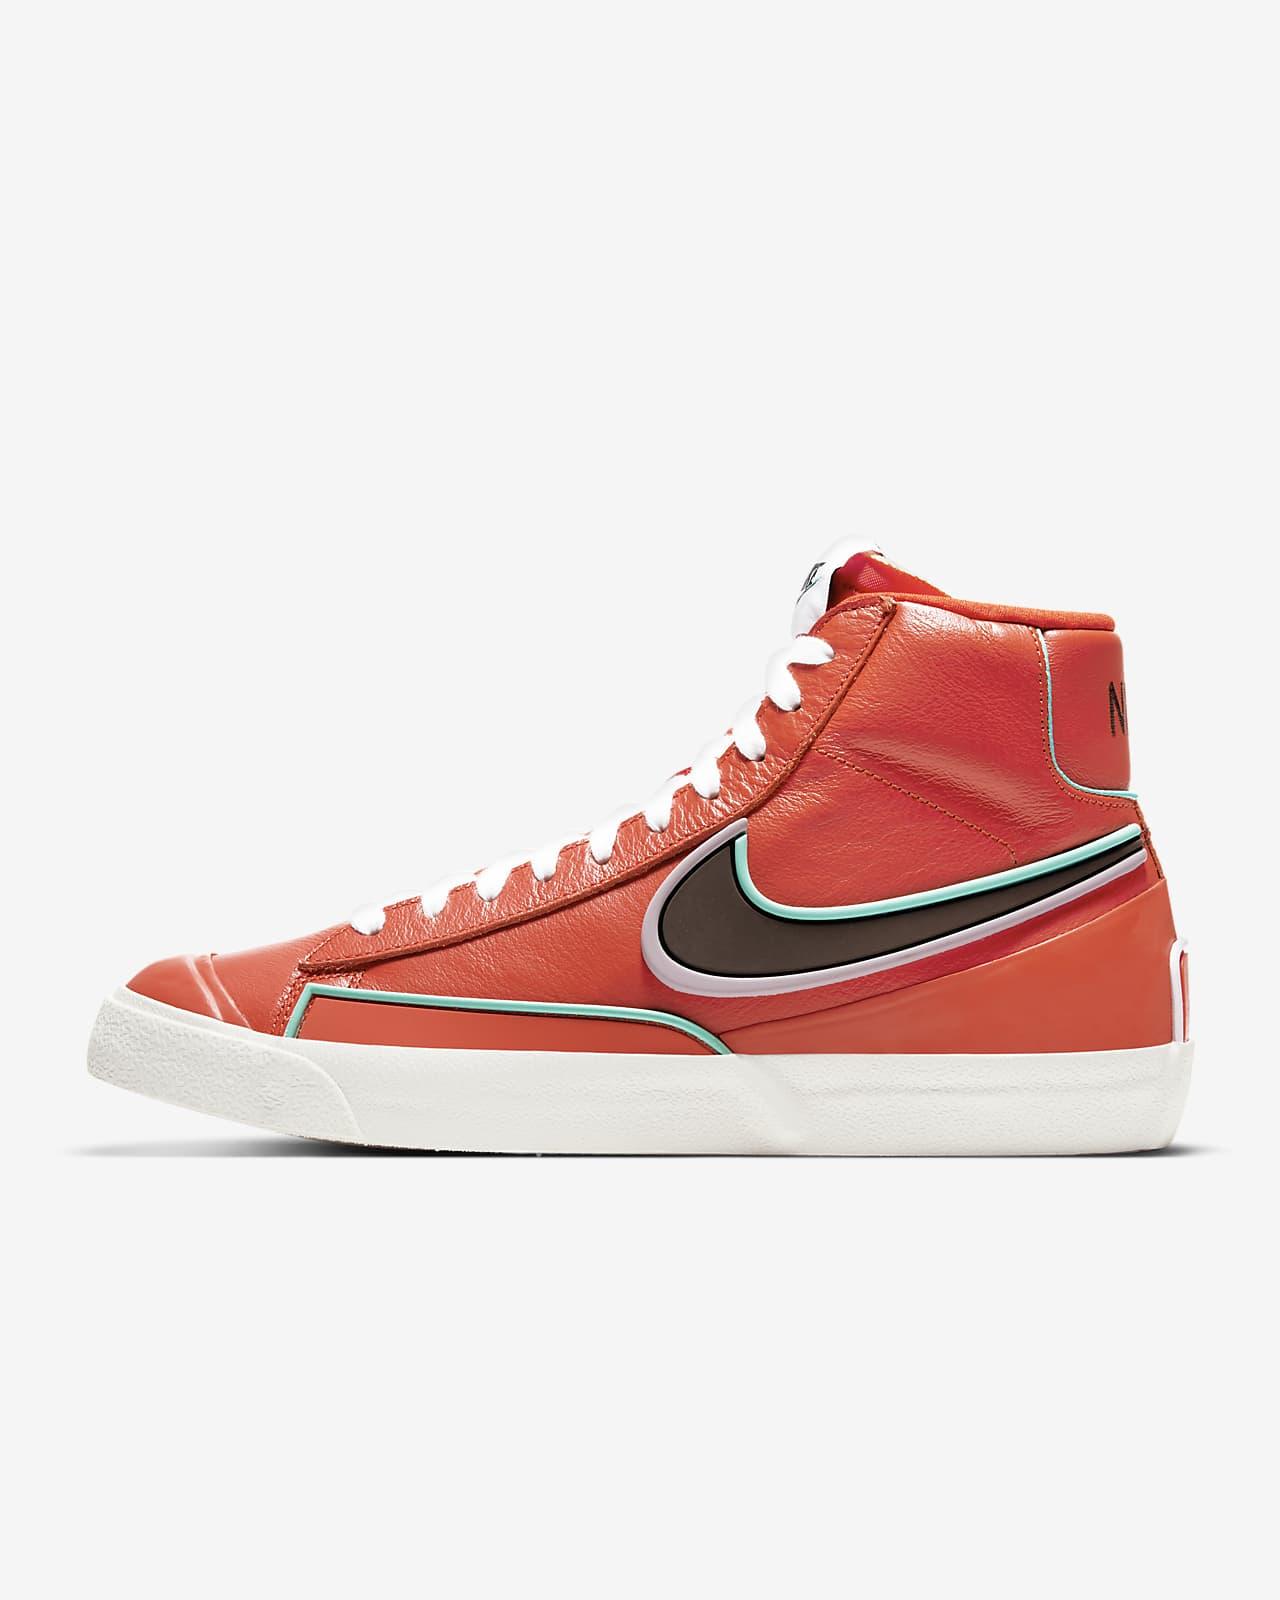 Nike Blazer 中筒 '77 Infinite 男鞋